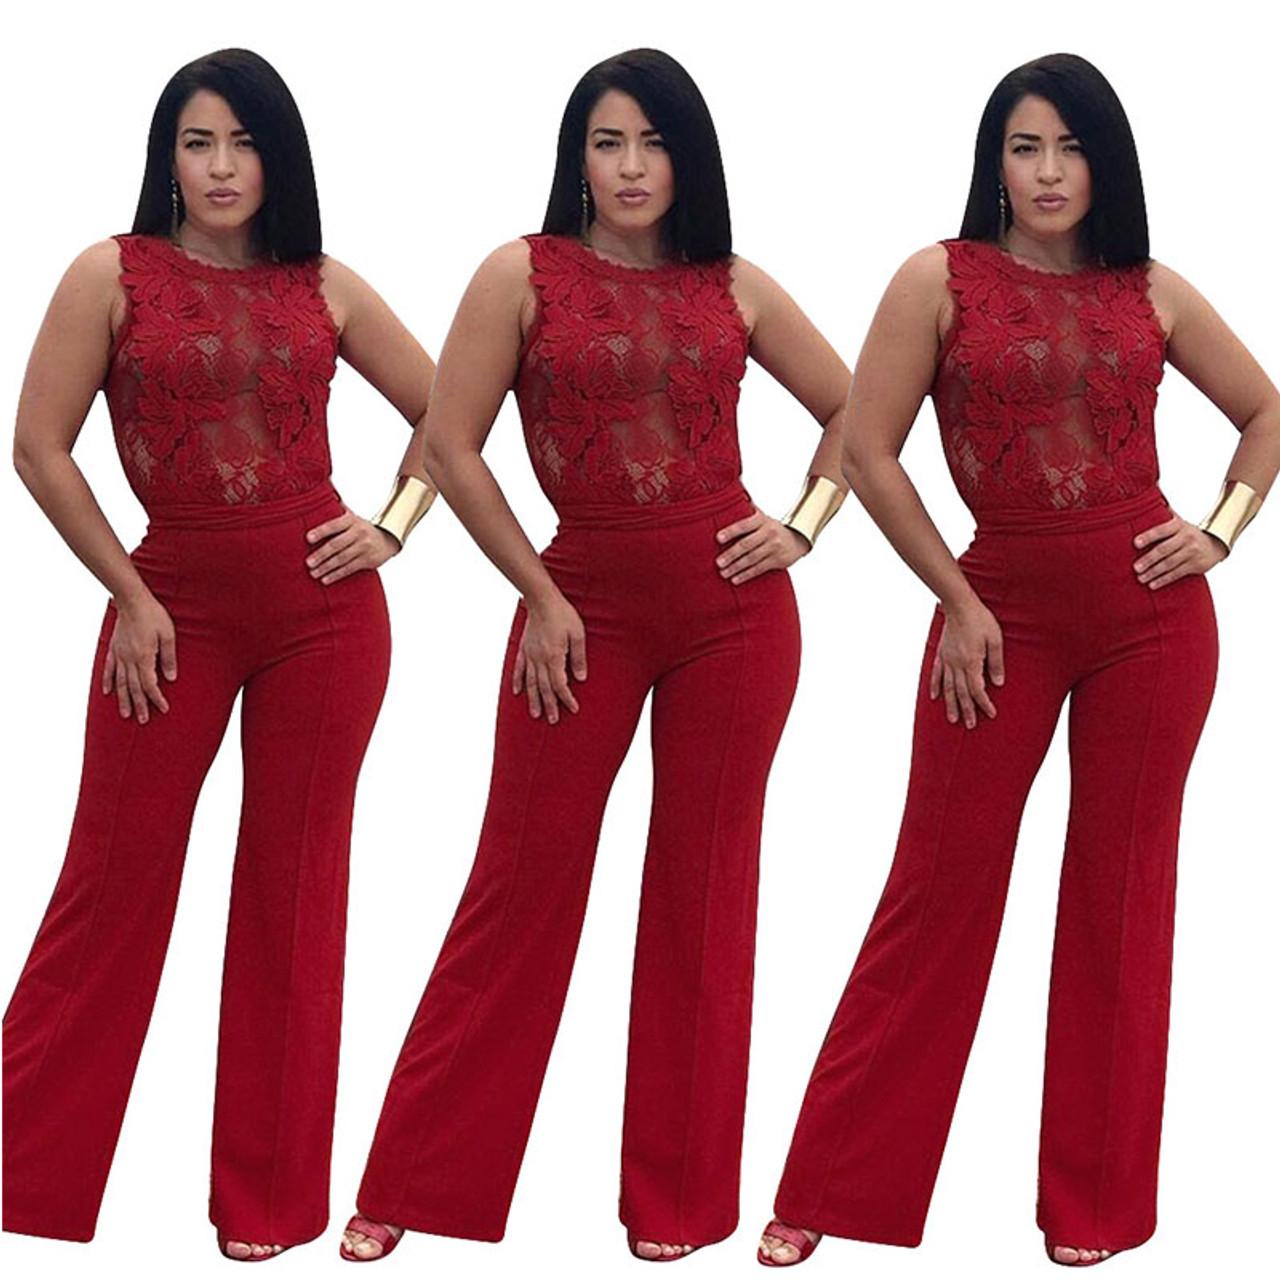 710de1fae7d ... Womens Rompers Jumpsuit Plus Size Jumpsuits For Women 2018 Summer  Overalls For Women Elegant Lace Body ...